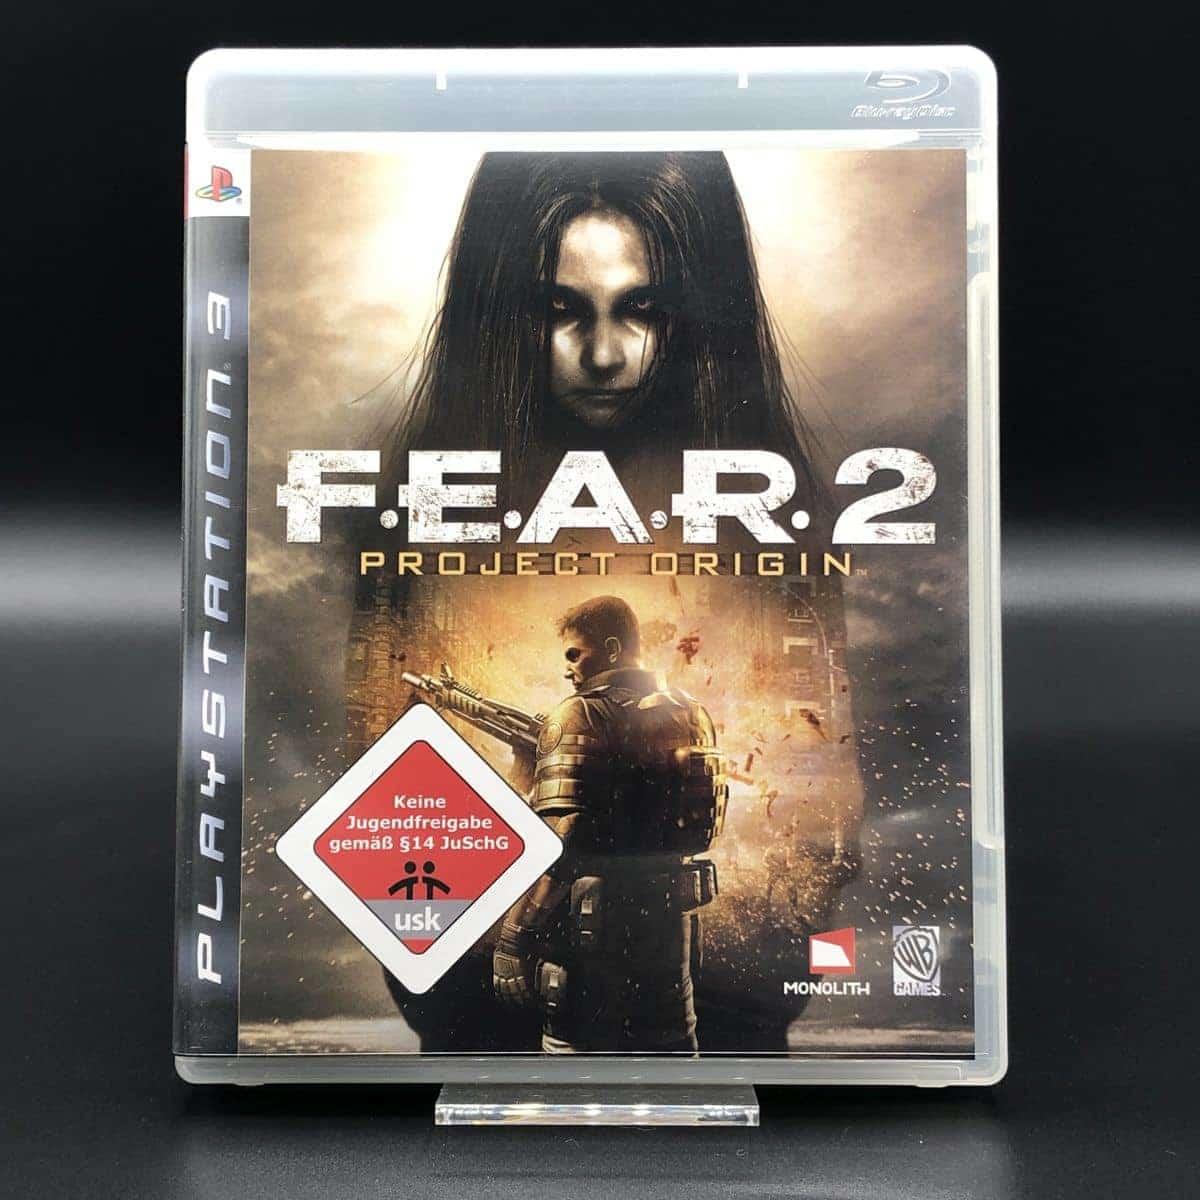 PS3 F.E.A.R. 2: Project Origin (Komplett) (Sehr gut) Sony PlayStation 3 (FSK18)